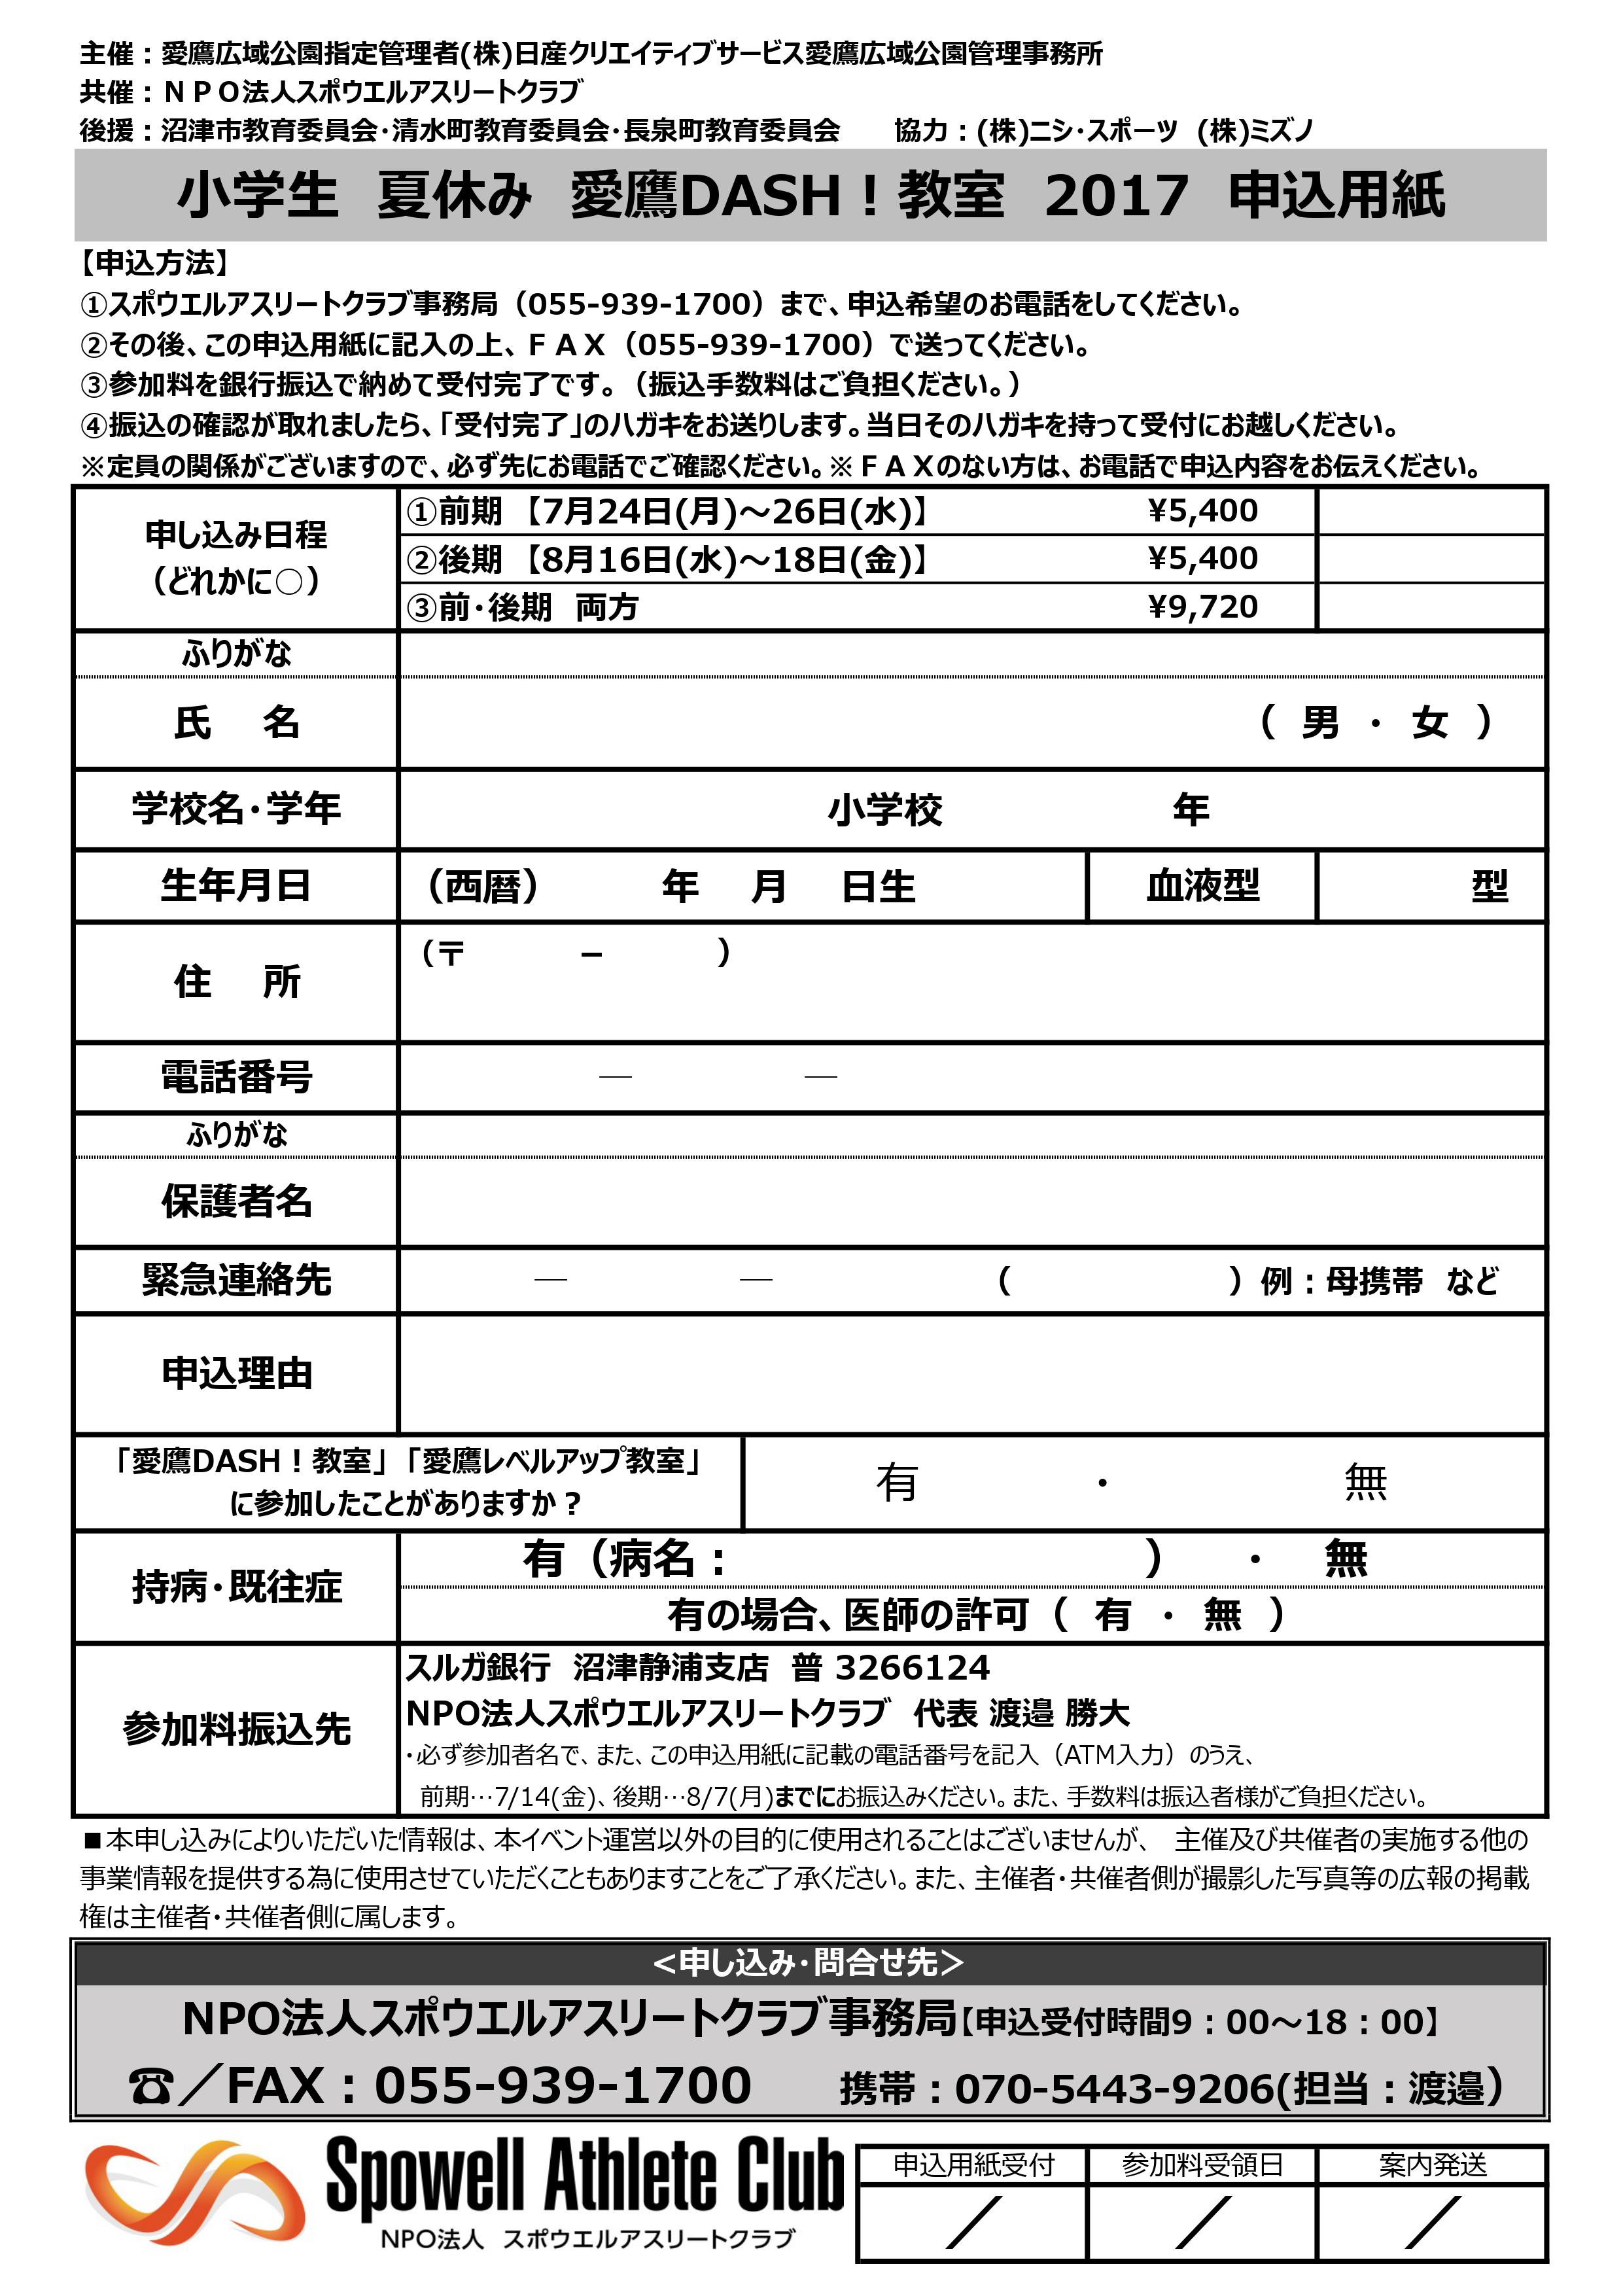 2017summer DASH moushikomi